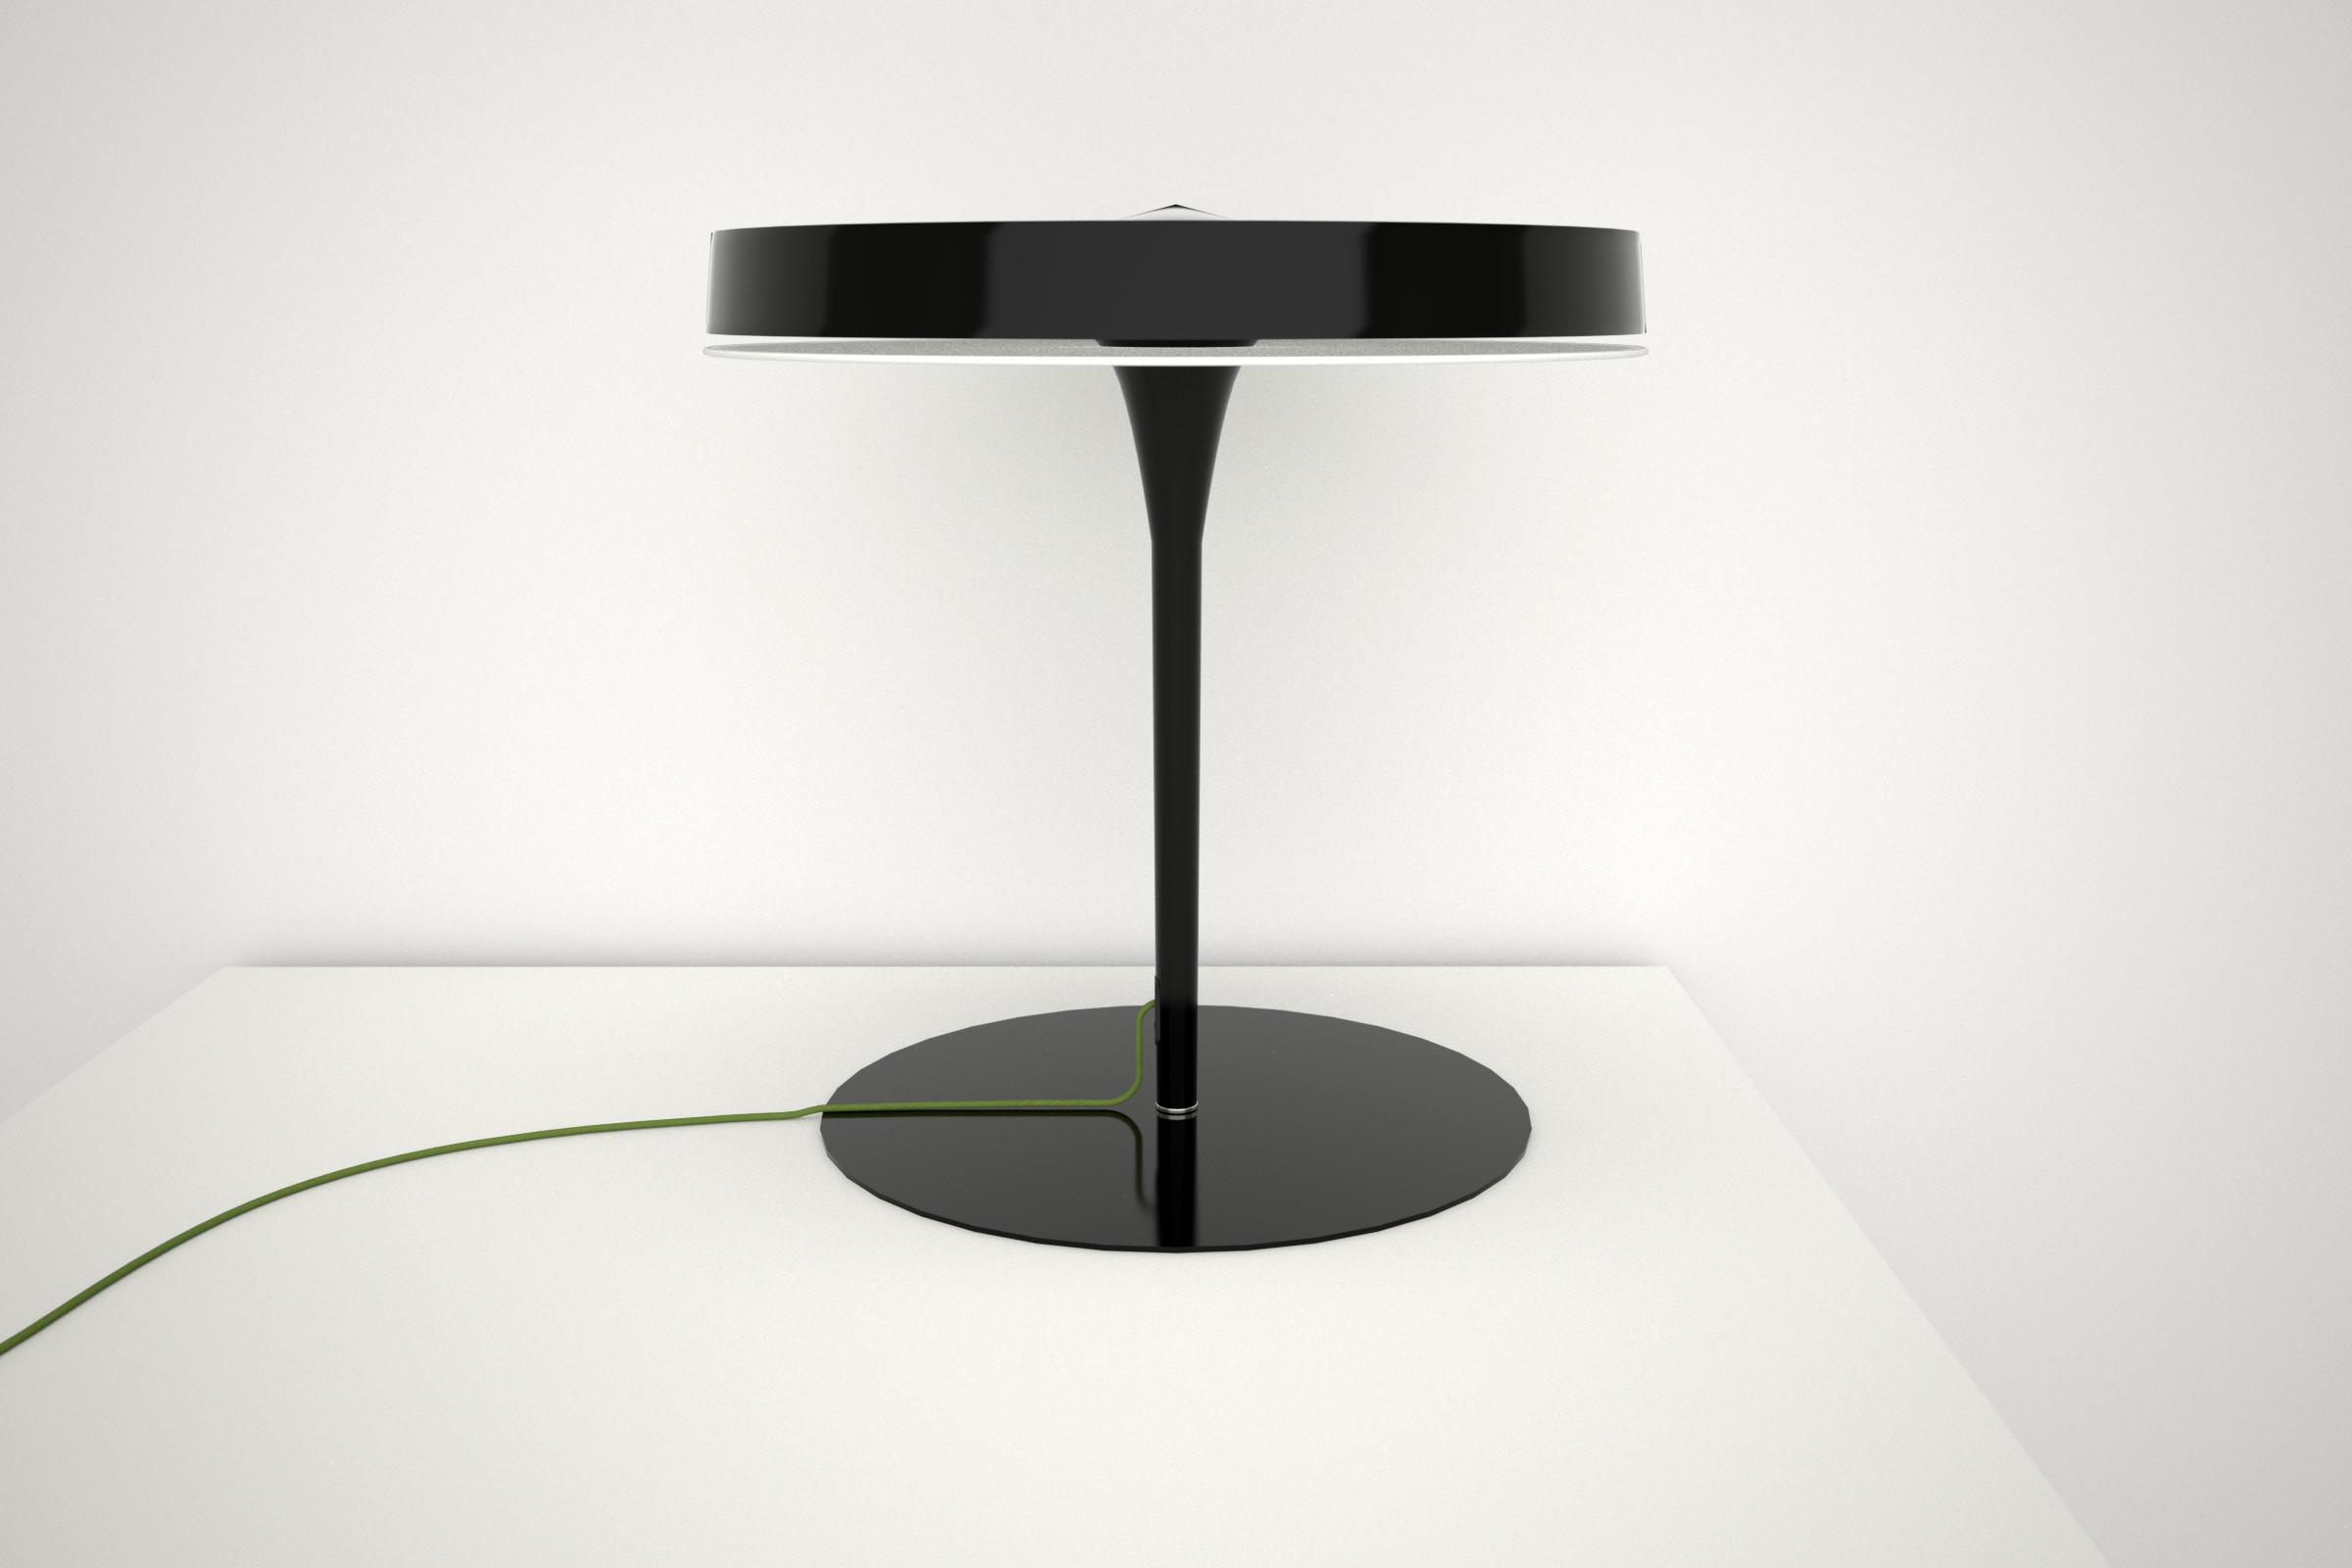 Olsen T Table Lamp 60W 2Gx13 - Black mate